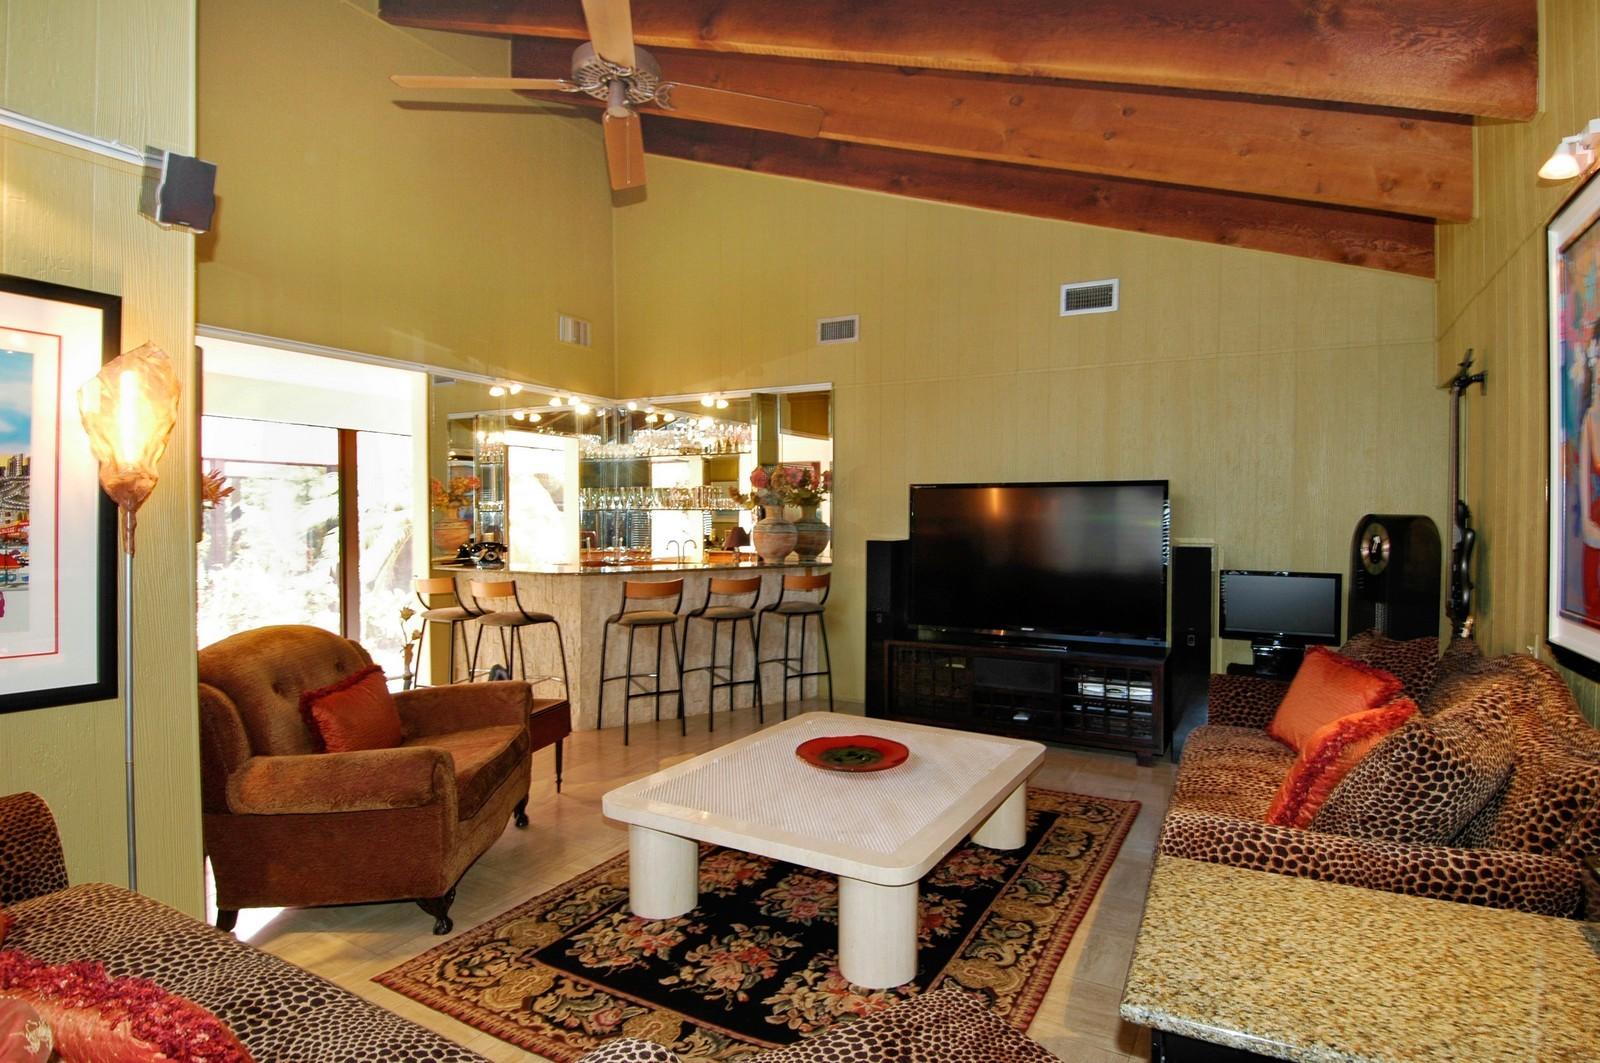 Real Estate Photography - 622 Golden Beach Dr, Golden Beach, FL, 33160 - Family Room